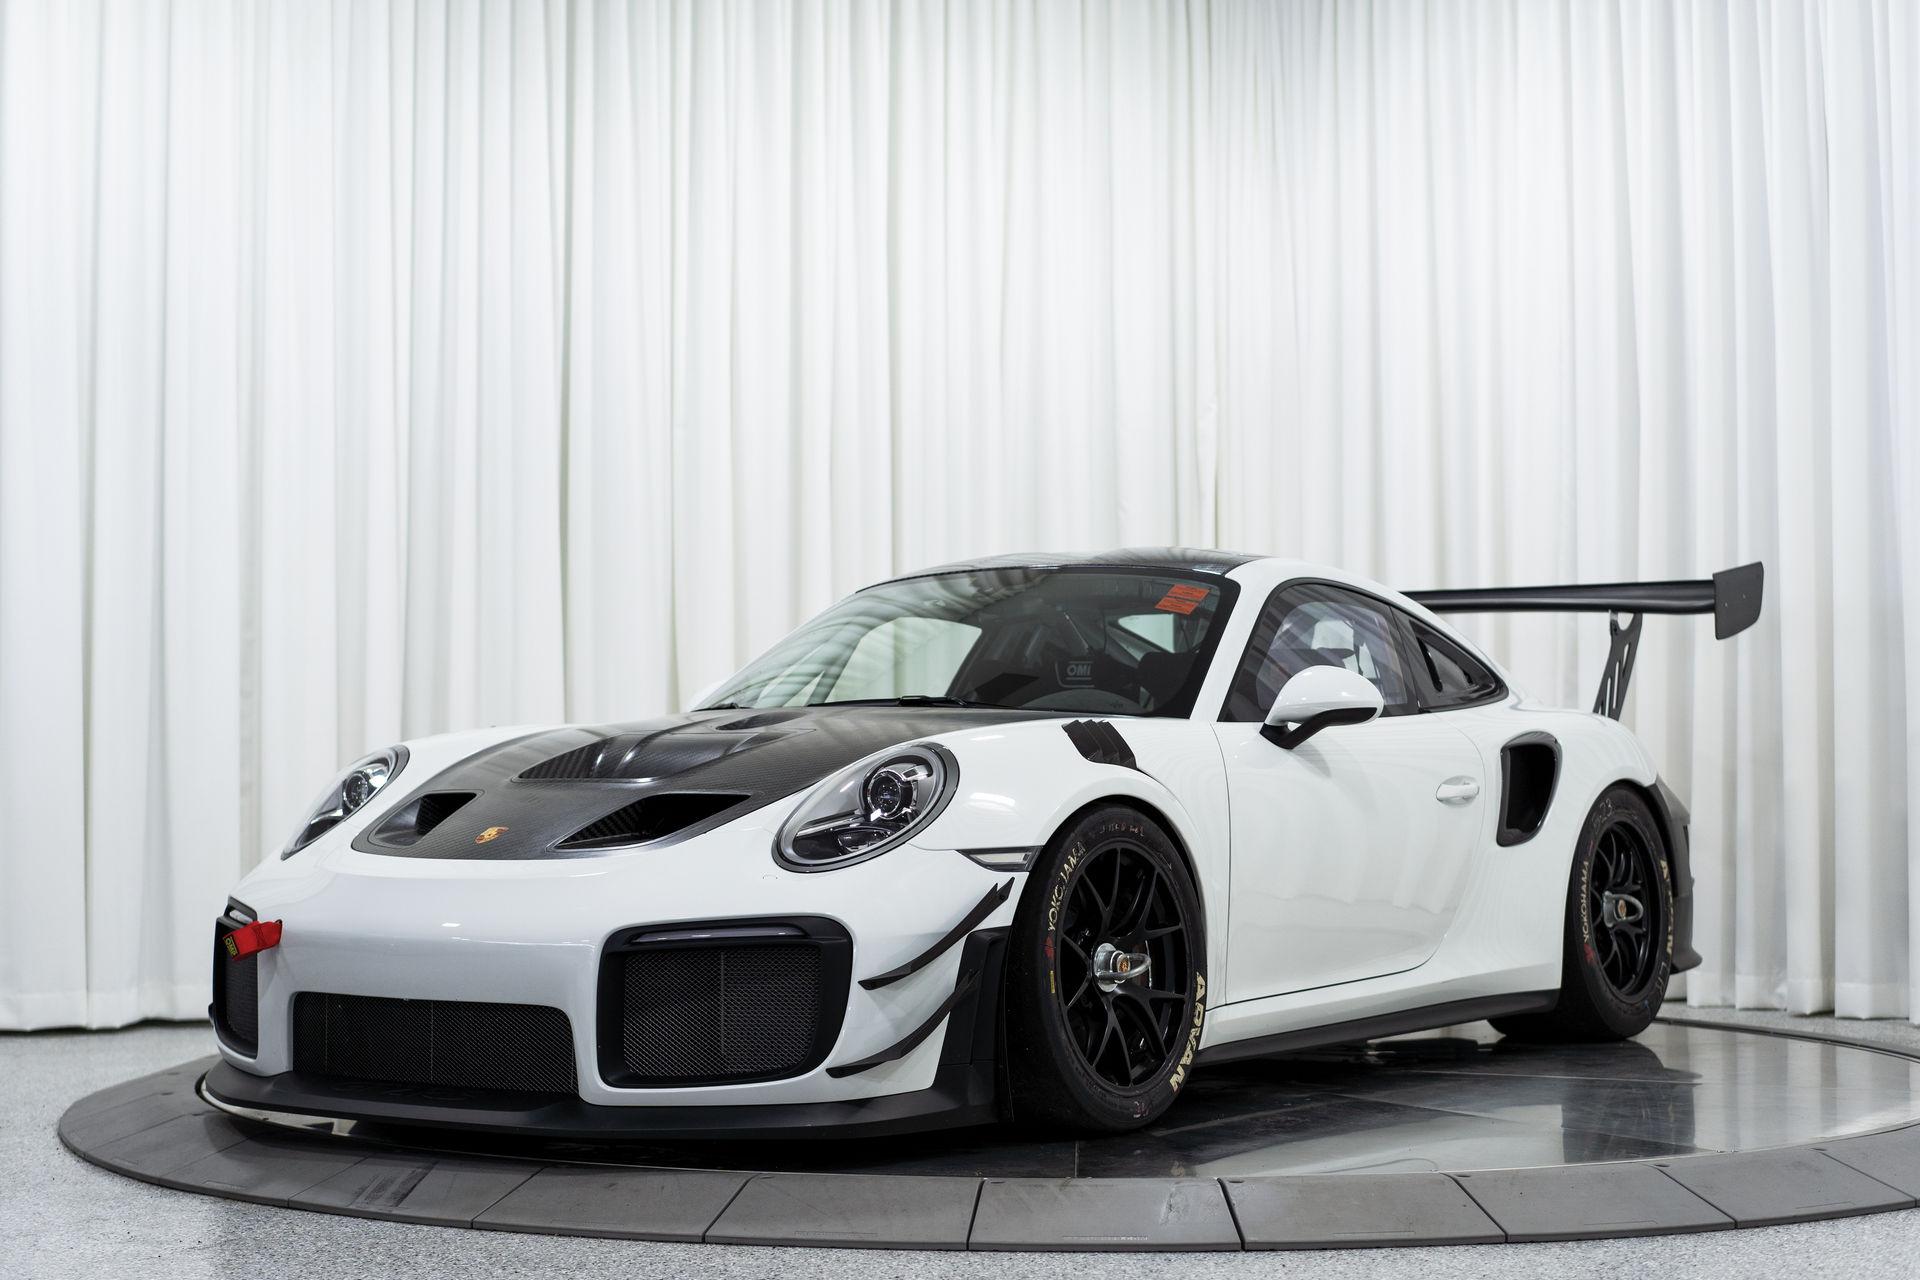 Porsche-911-GT2-RS-Clubsport-auction-1